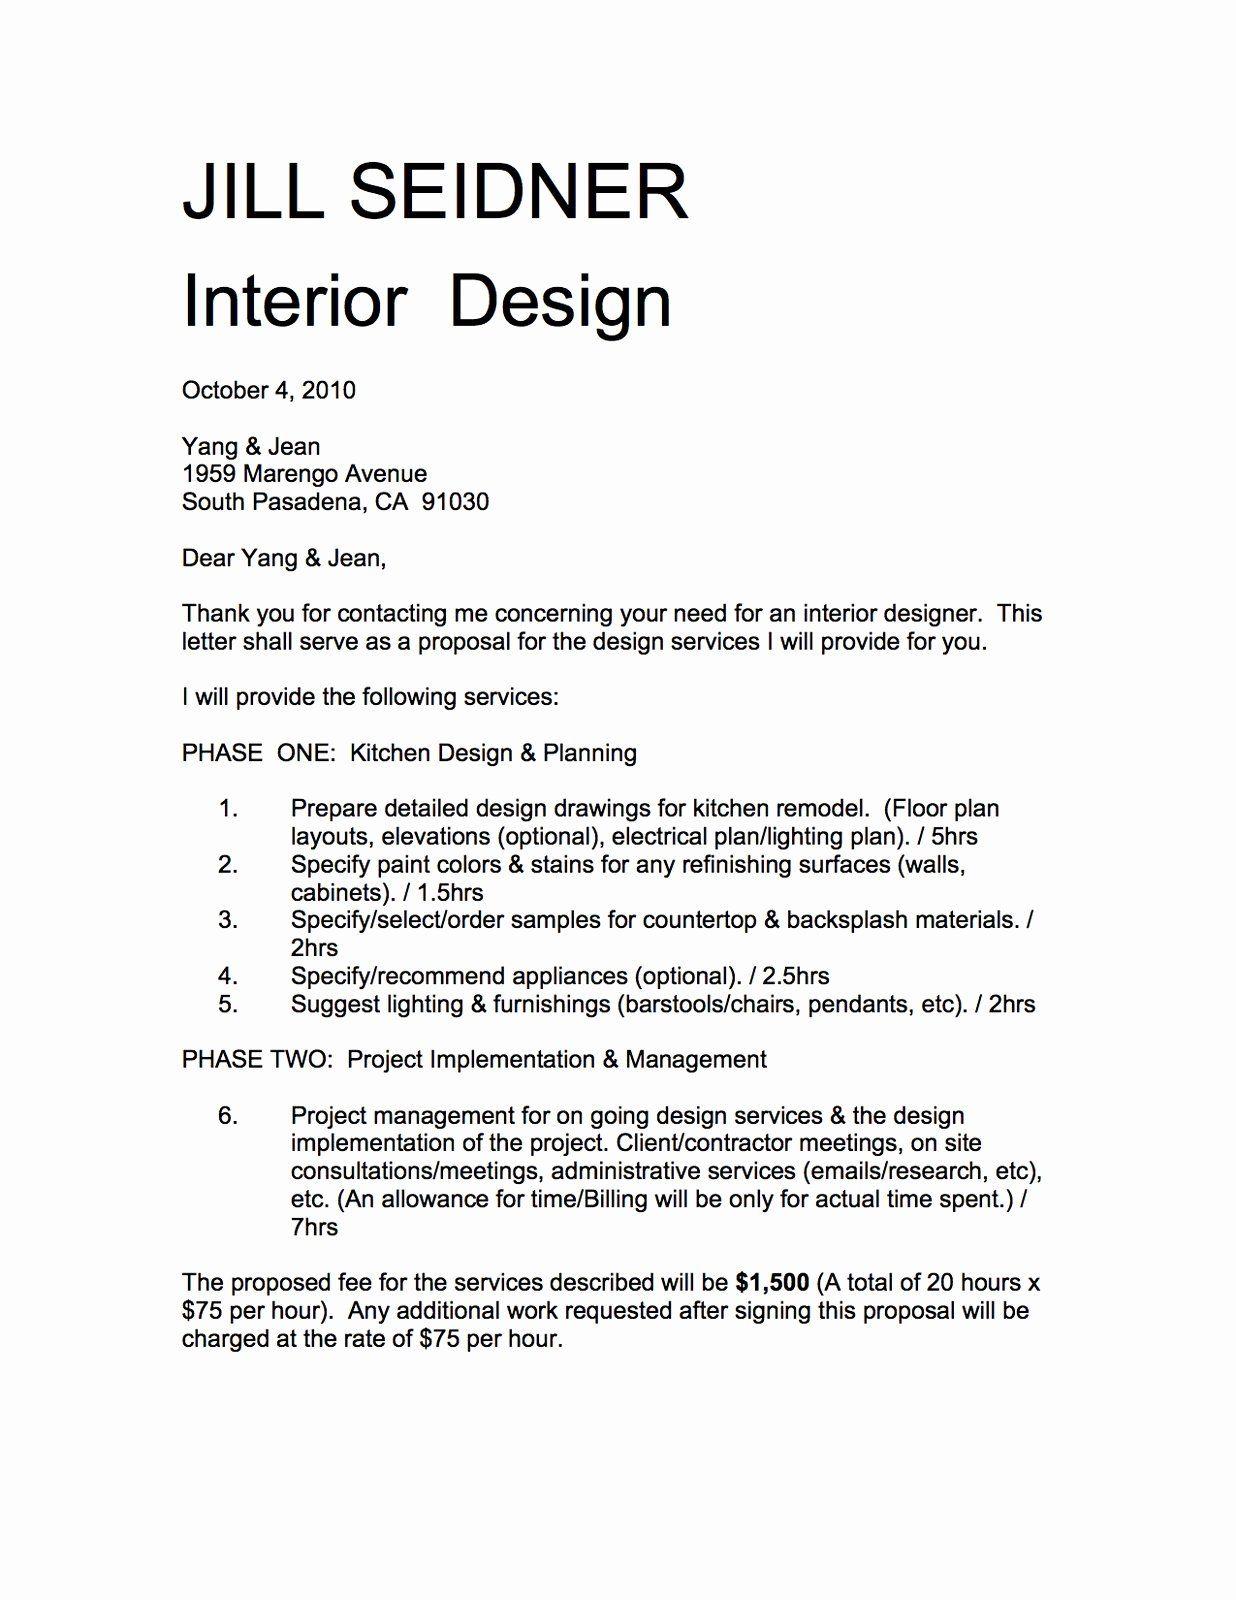 Interior Design Proposal Template Awesome Jill Seidner Interior Design Yang Jean Kitchen In 2020 Service Design Proposal Proposal Templates